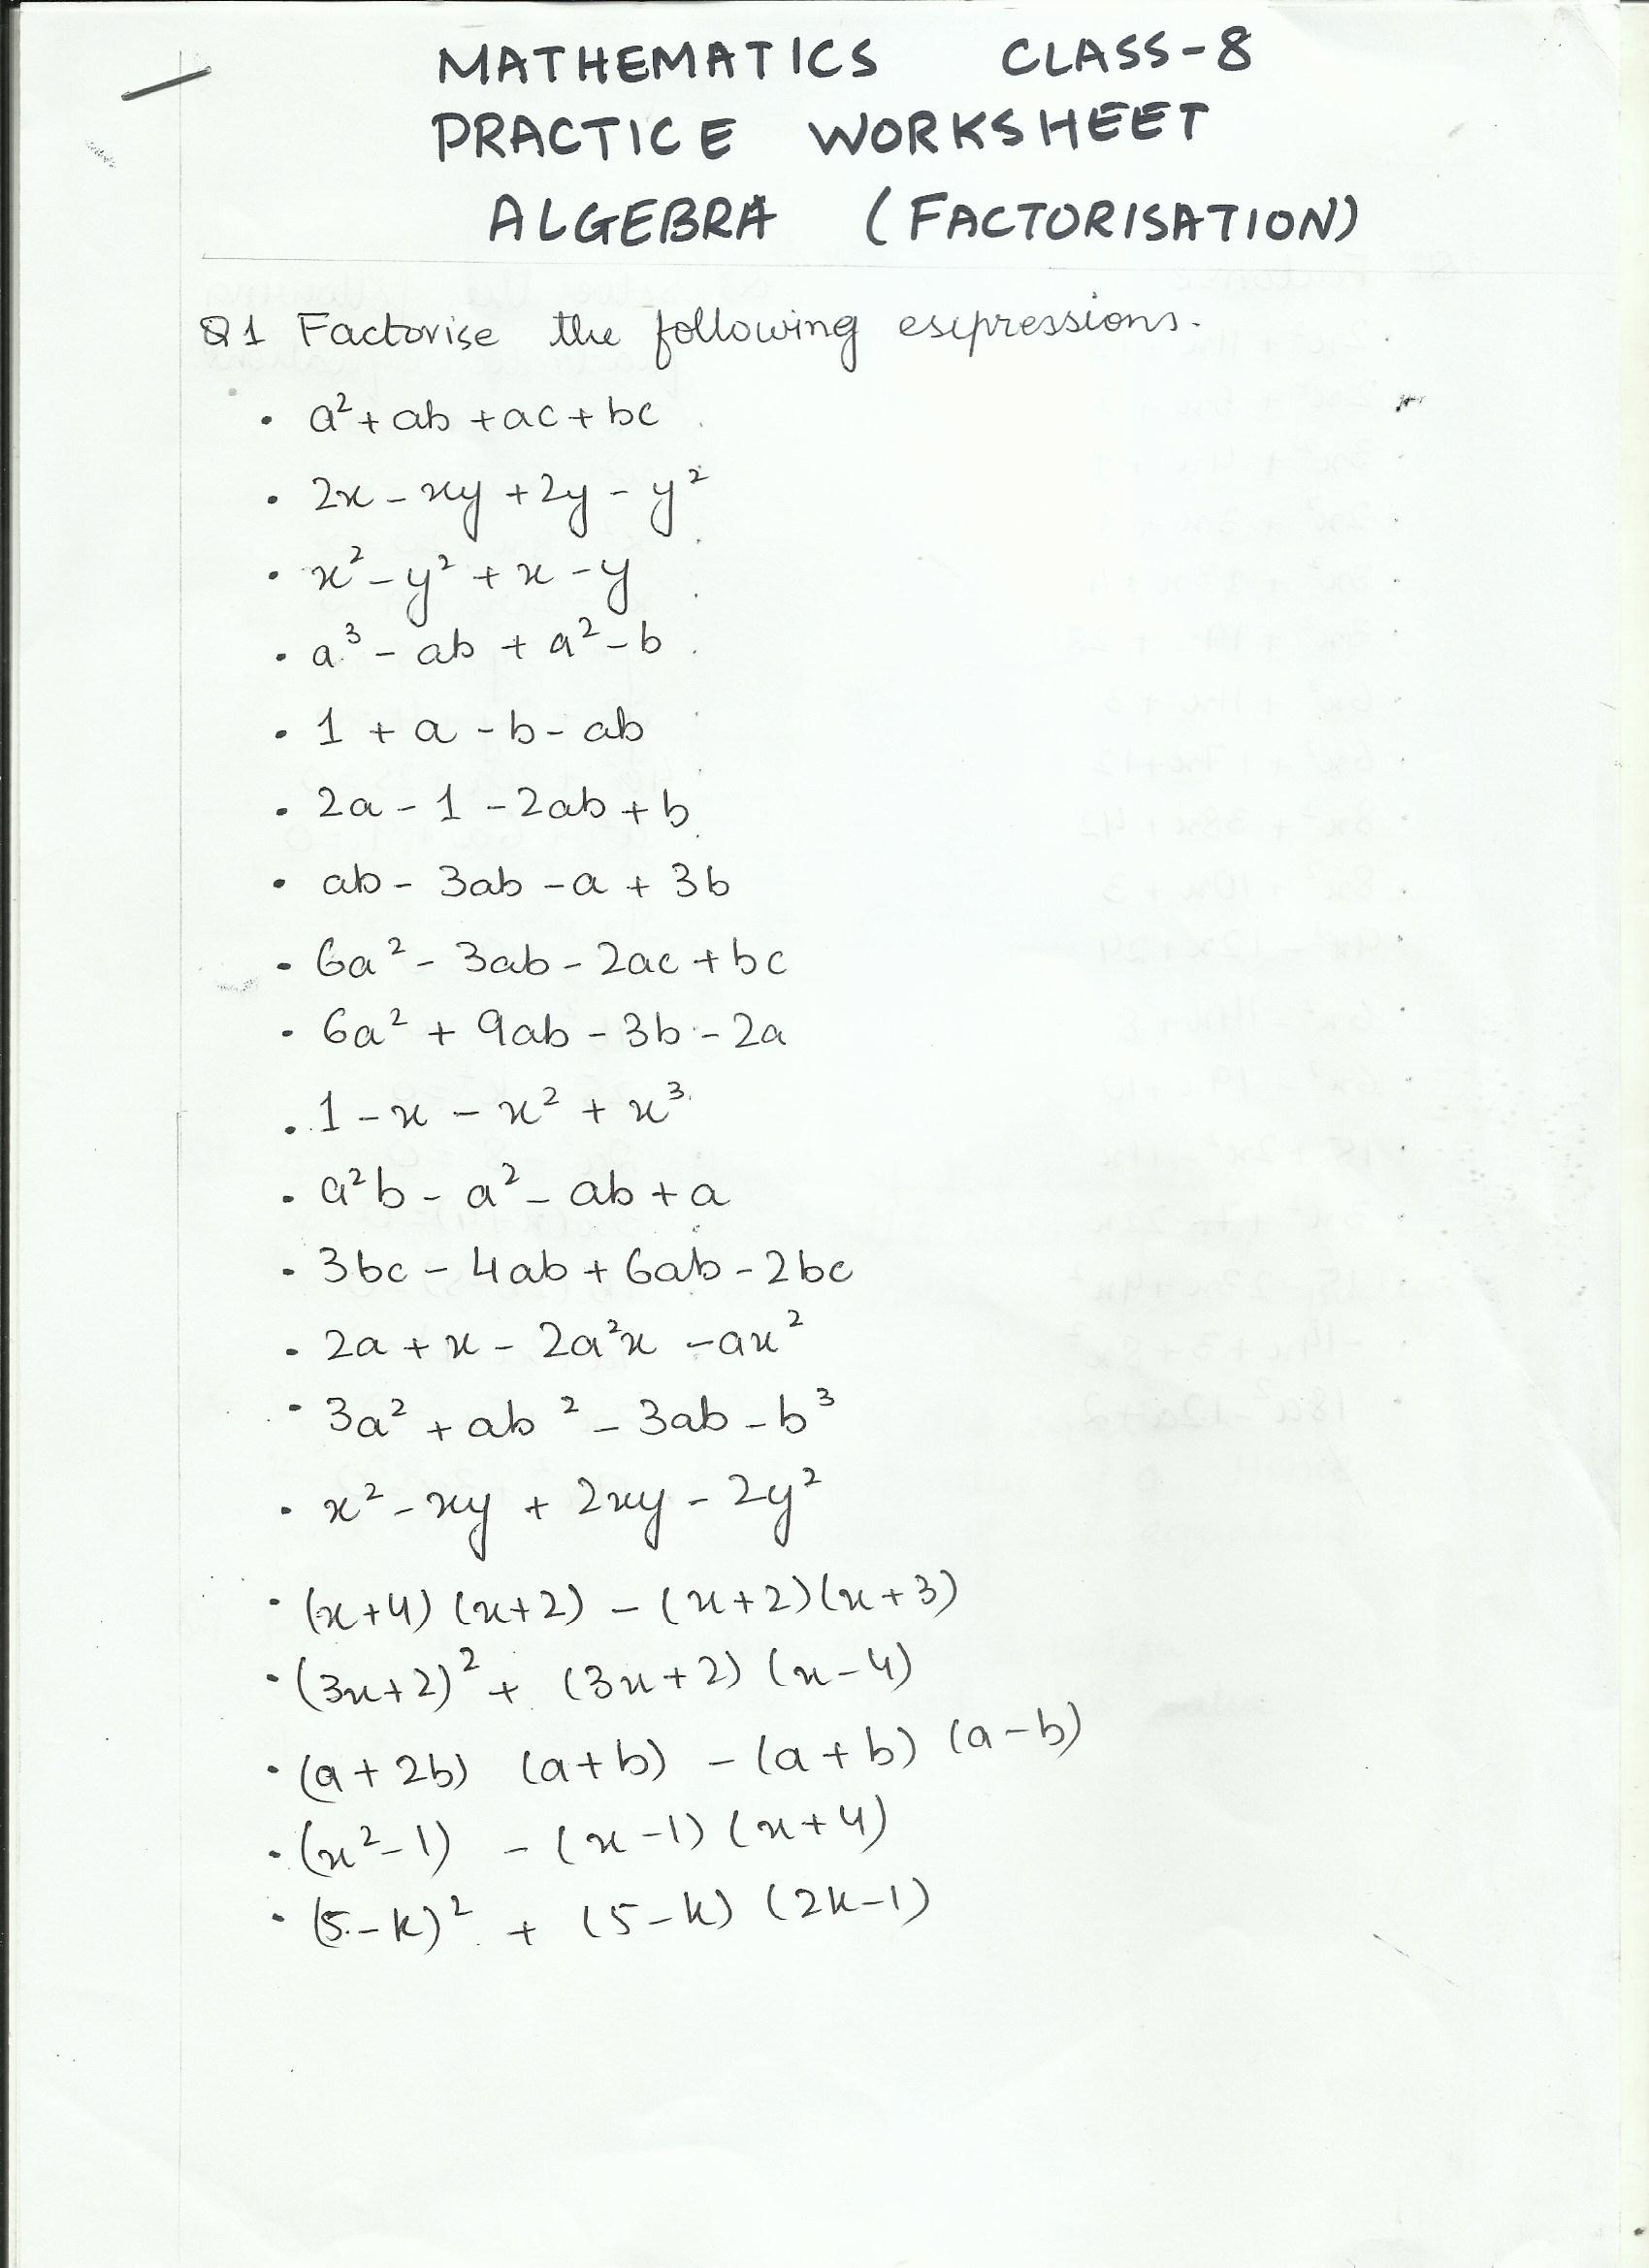 Mathematics Practice Worksheet Class 8